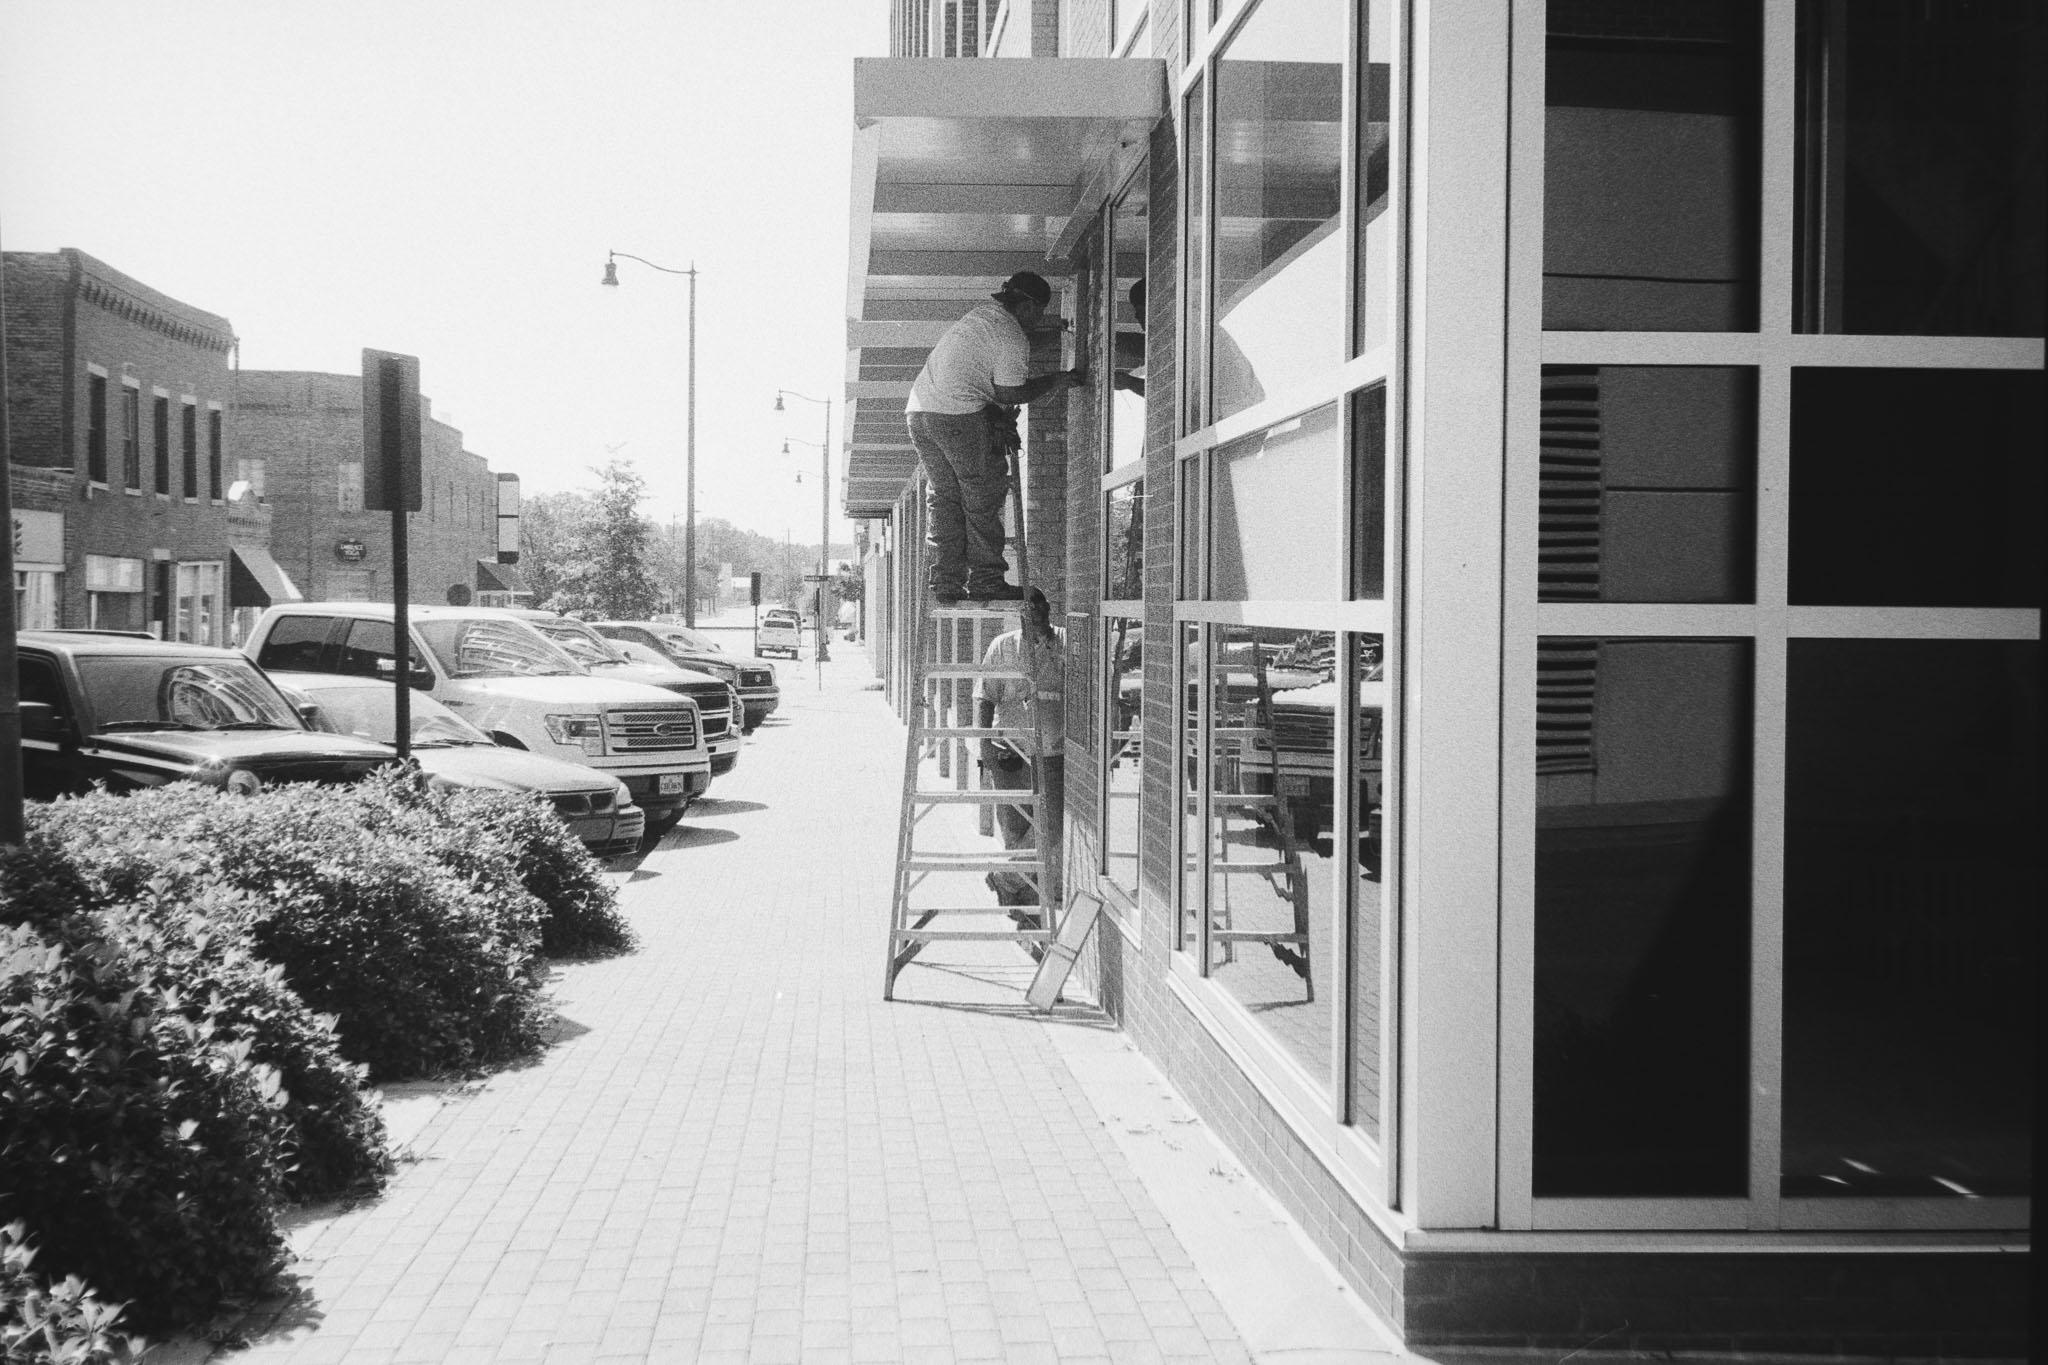 Camera:Minolta CLE  Lens: 40mm M Rokkor  Film: HP5 @ 800